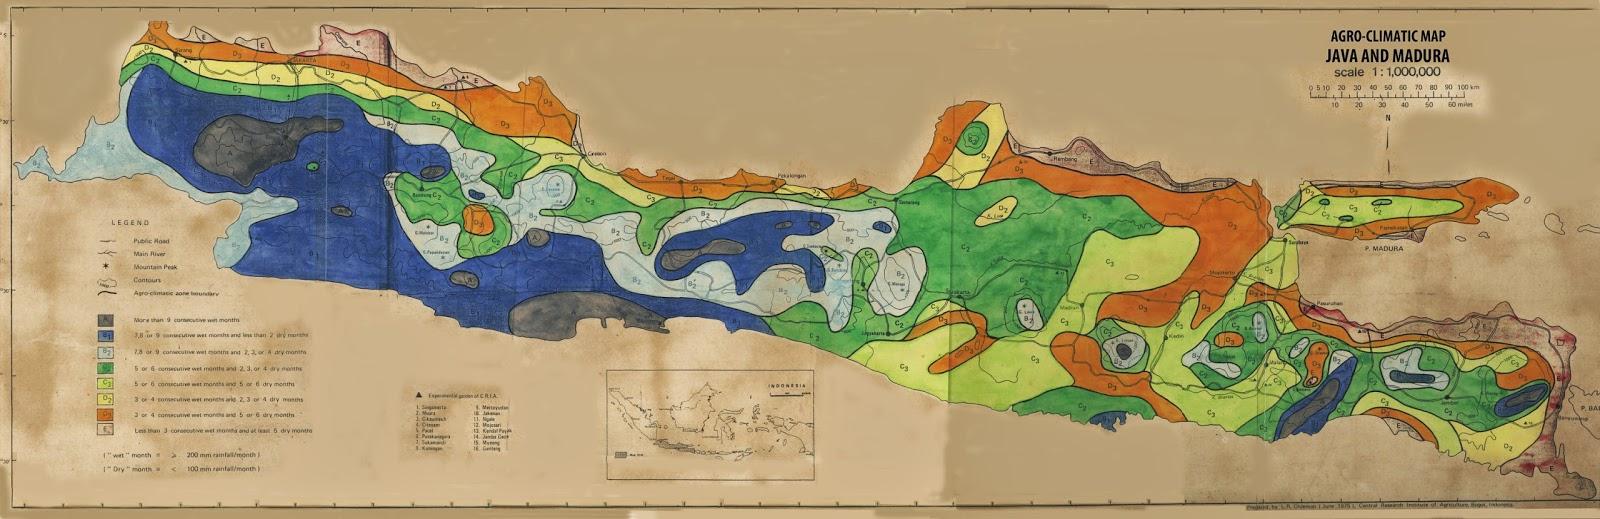 Peta Lengkap Indonesia Agroclimatic Pulau Jawa Madura Gambar Daerah